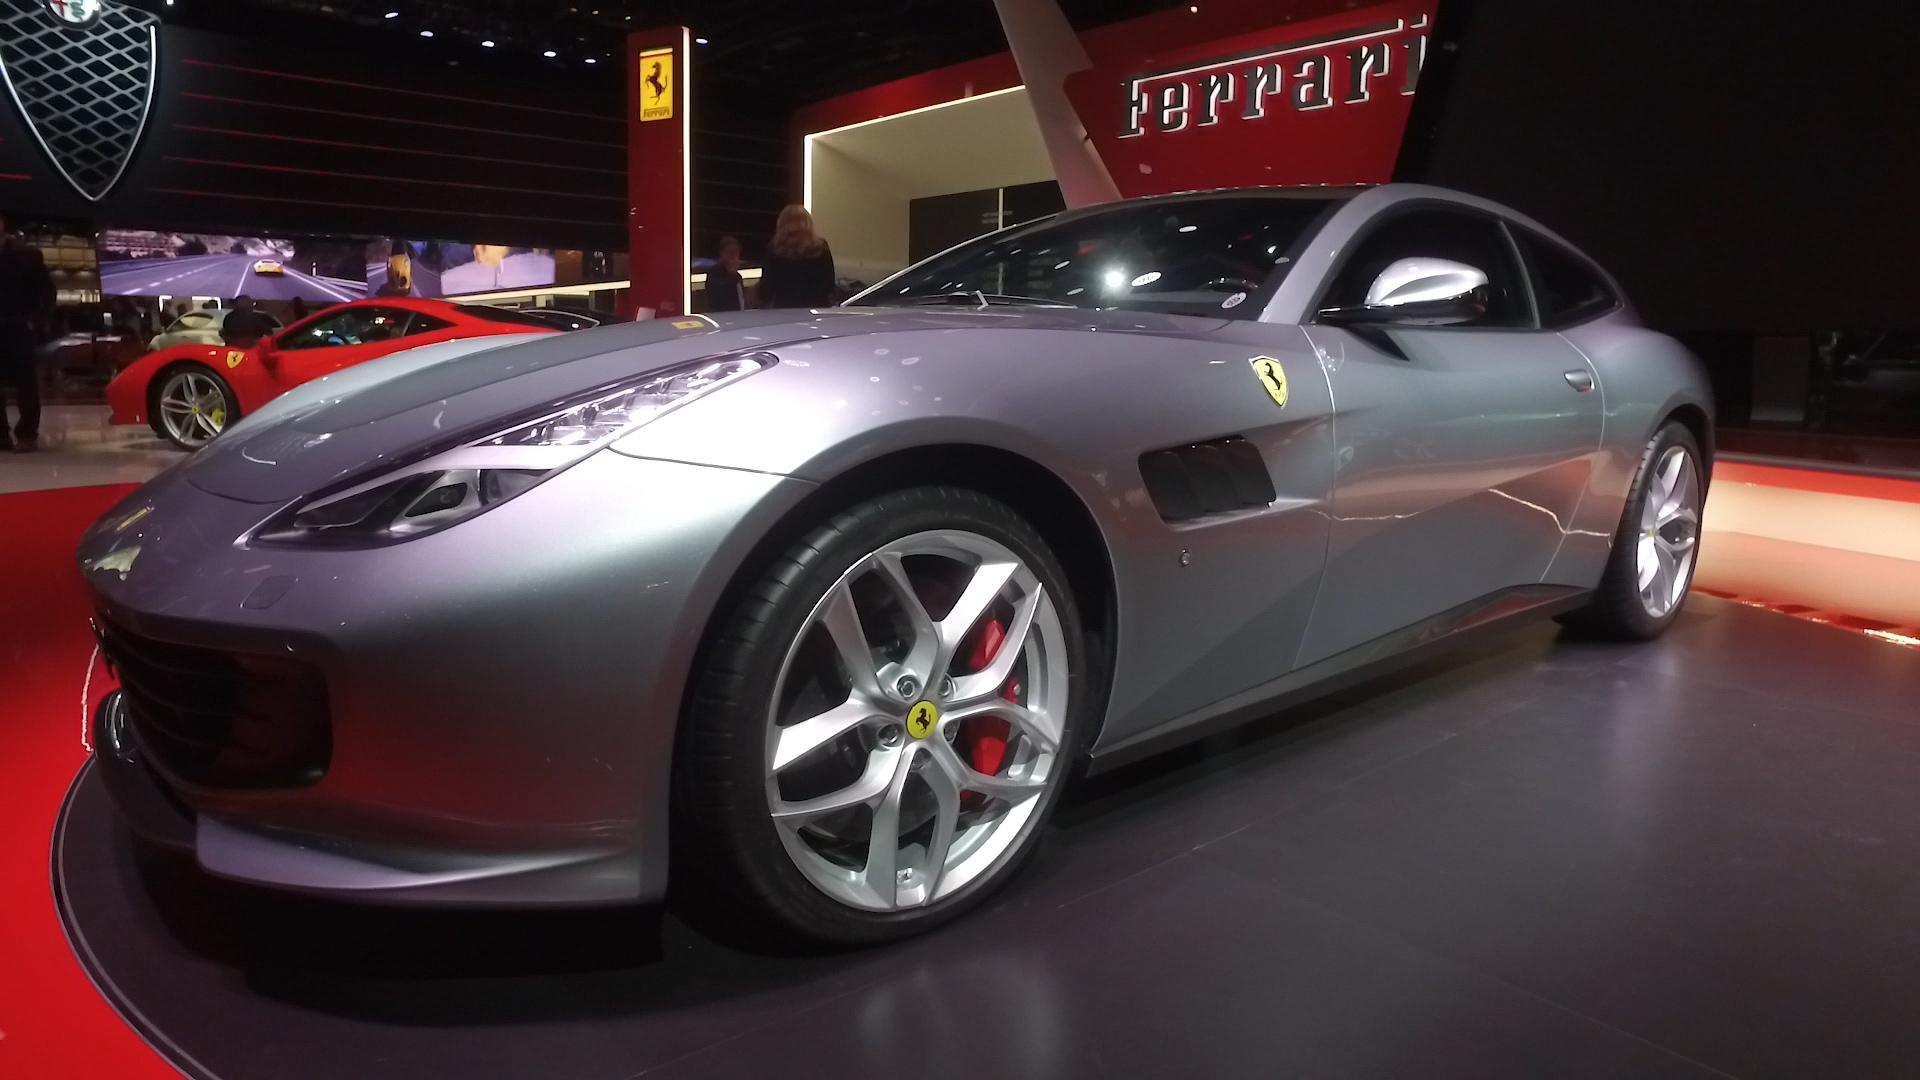 1959 Ferrari 250 Gt California Sells For Nearly 18m